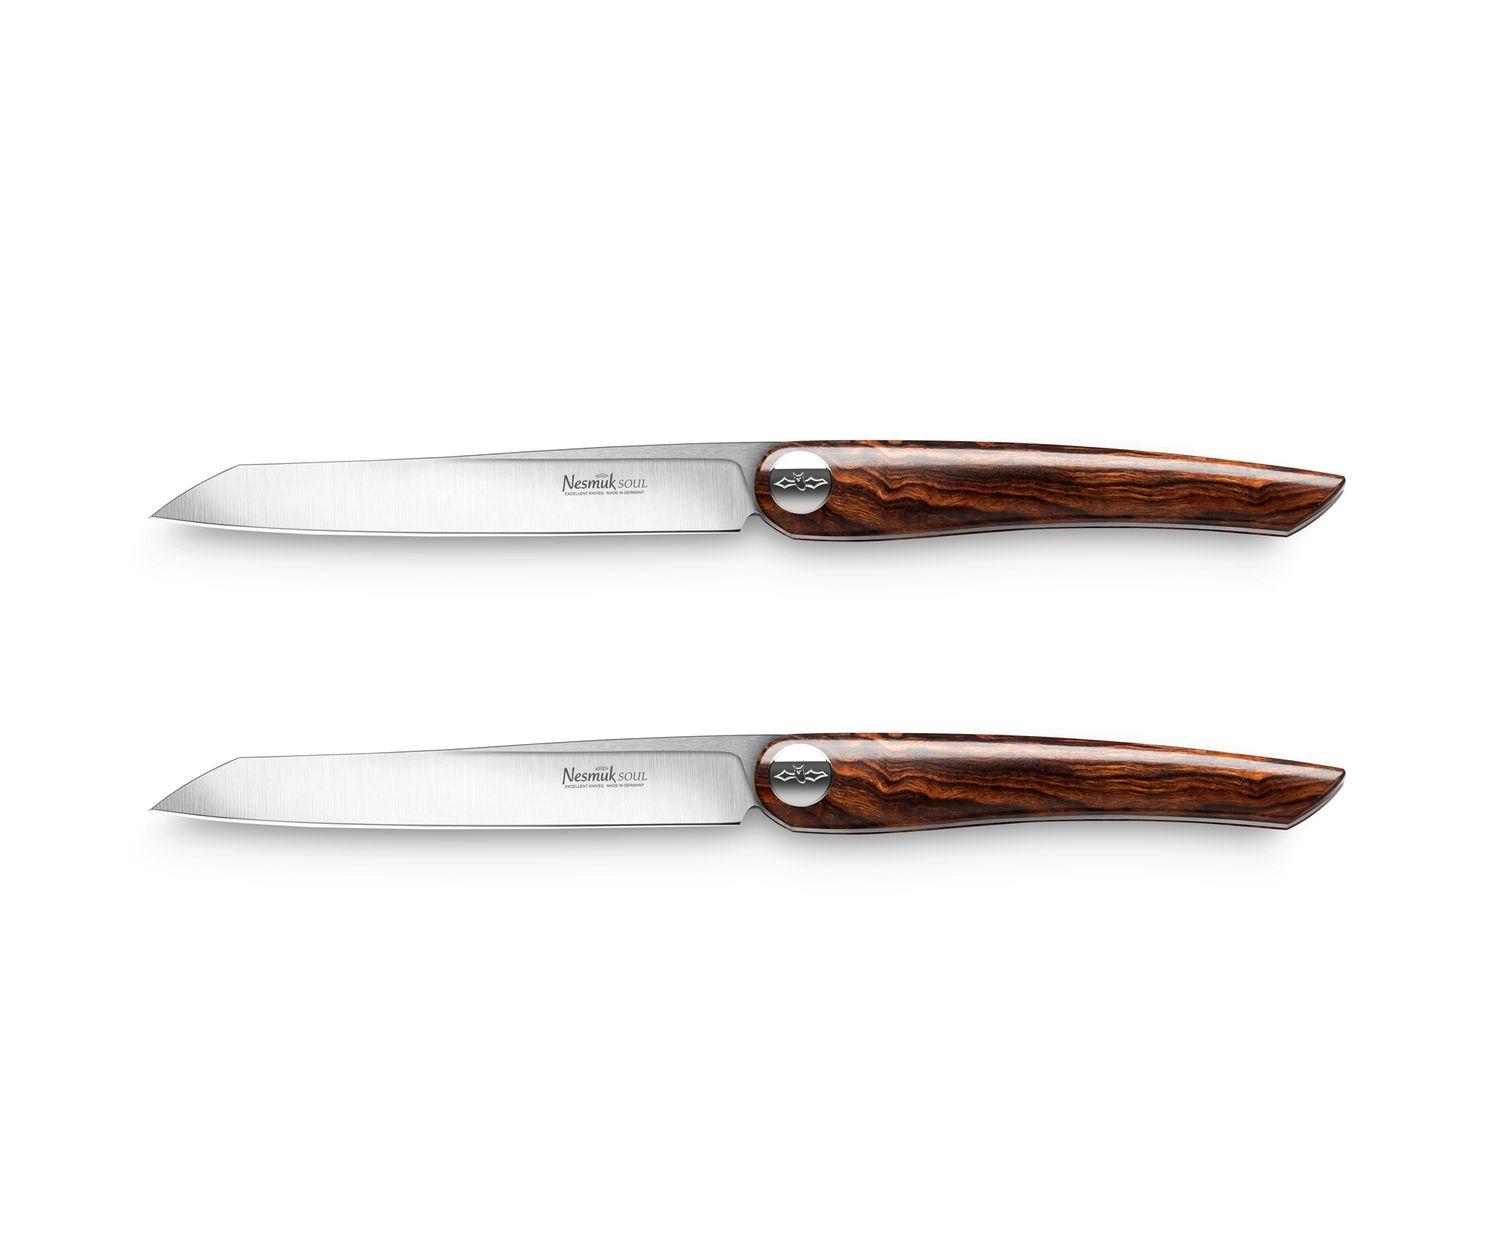 Nesmuk Steakmesser Wüsteneisenholz, 2 Stk, Soul